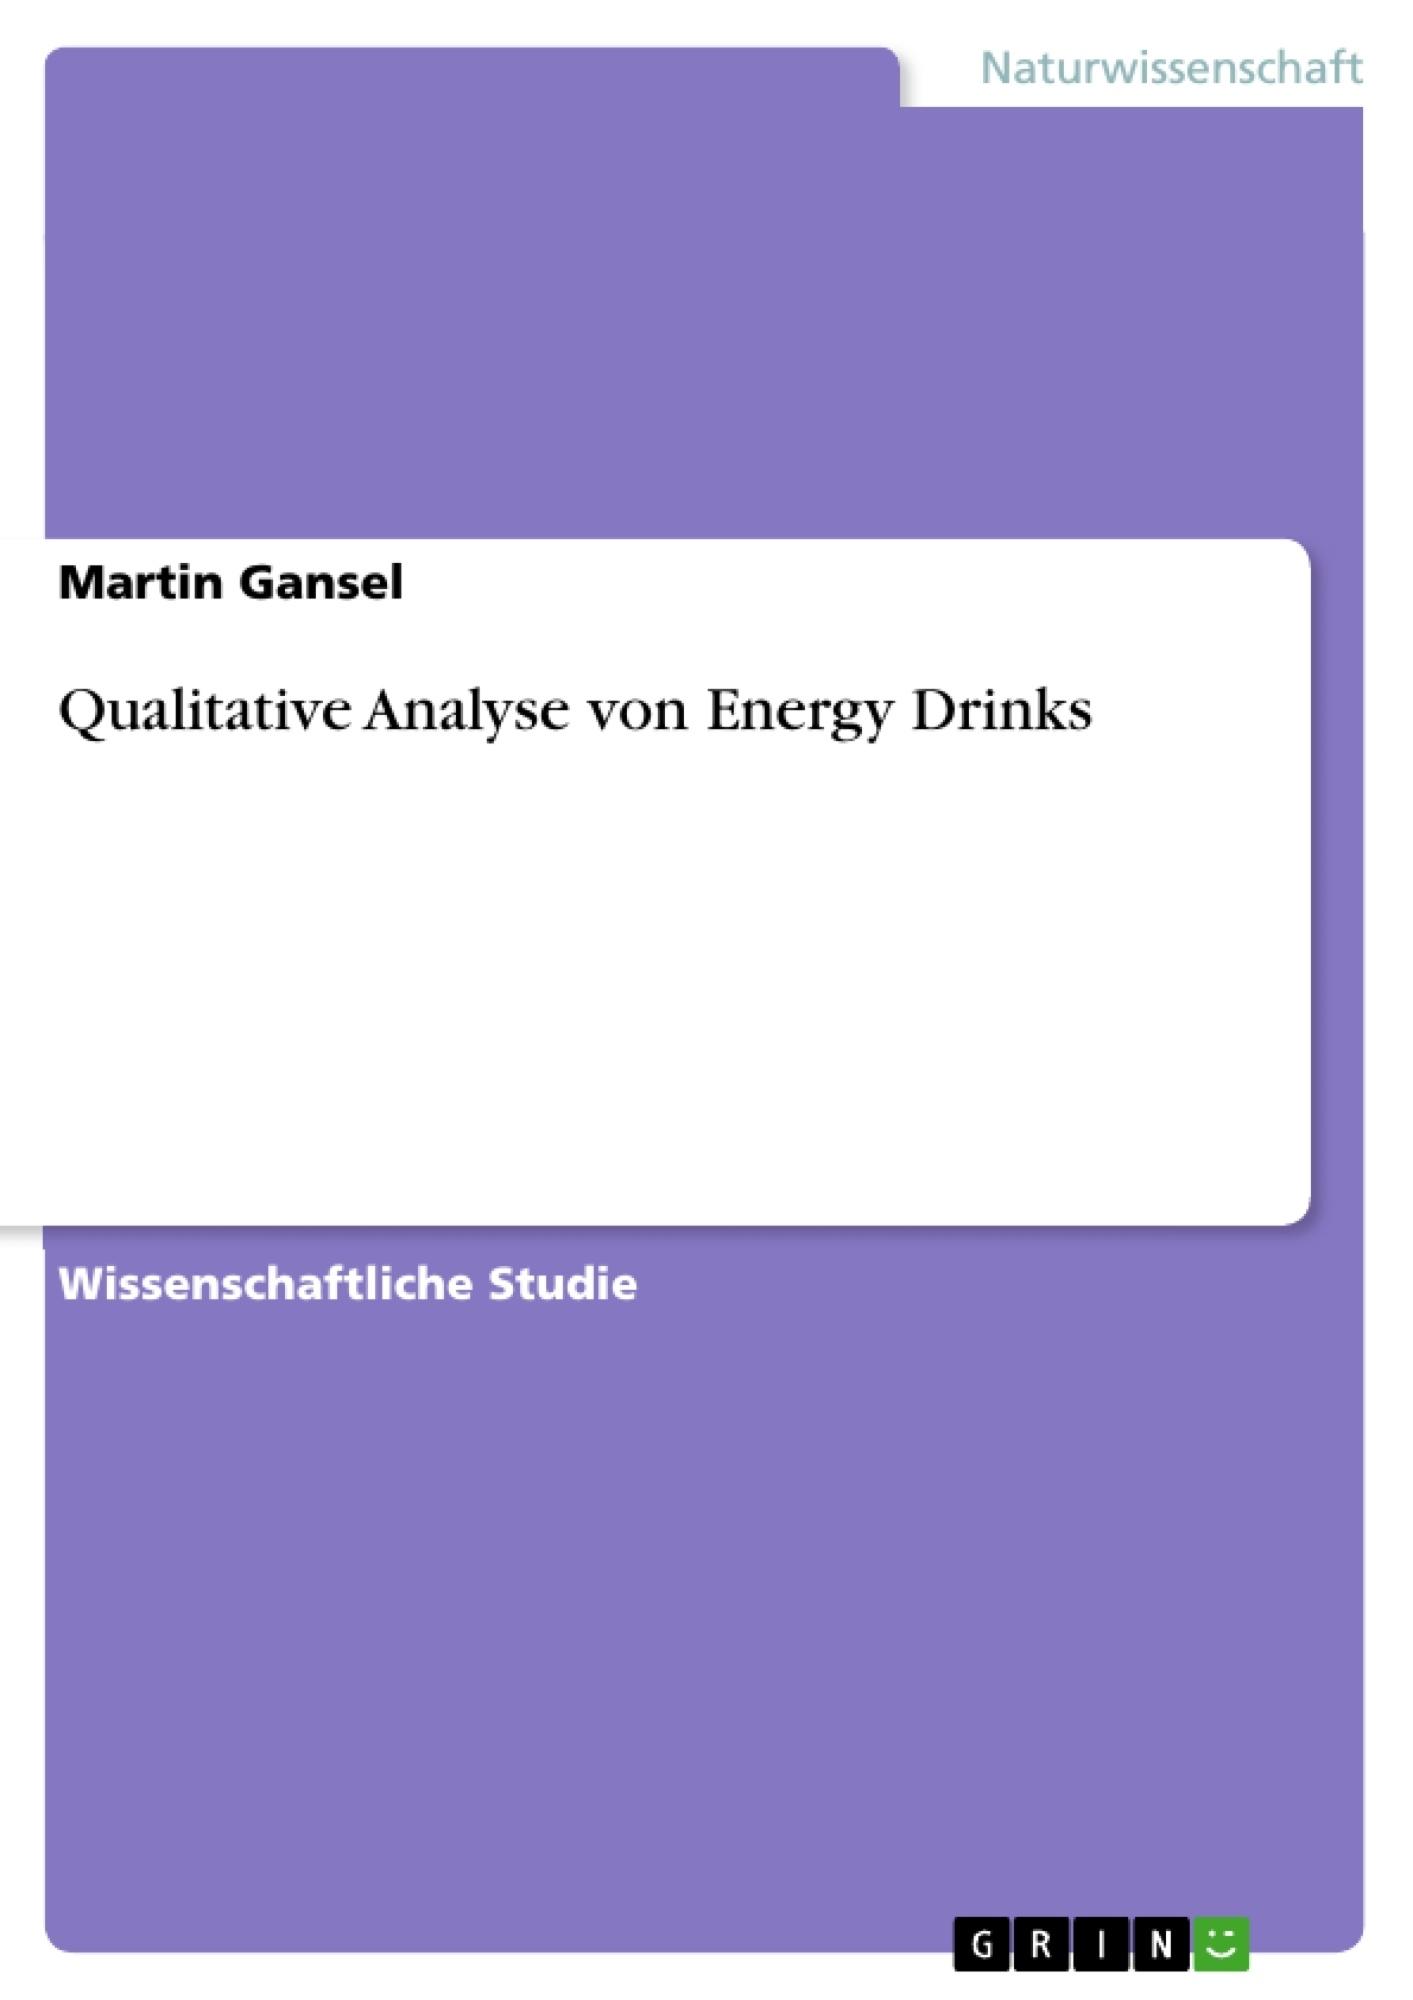 Titel: Qualitative Analyse von Energy Drinks